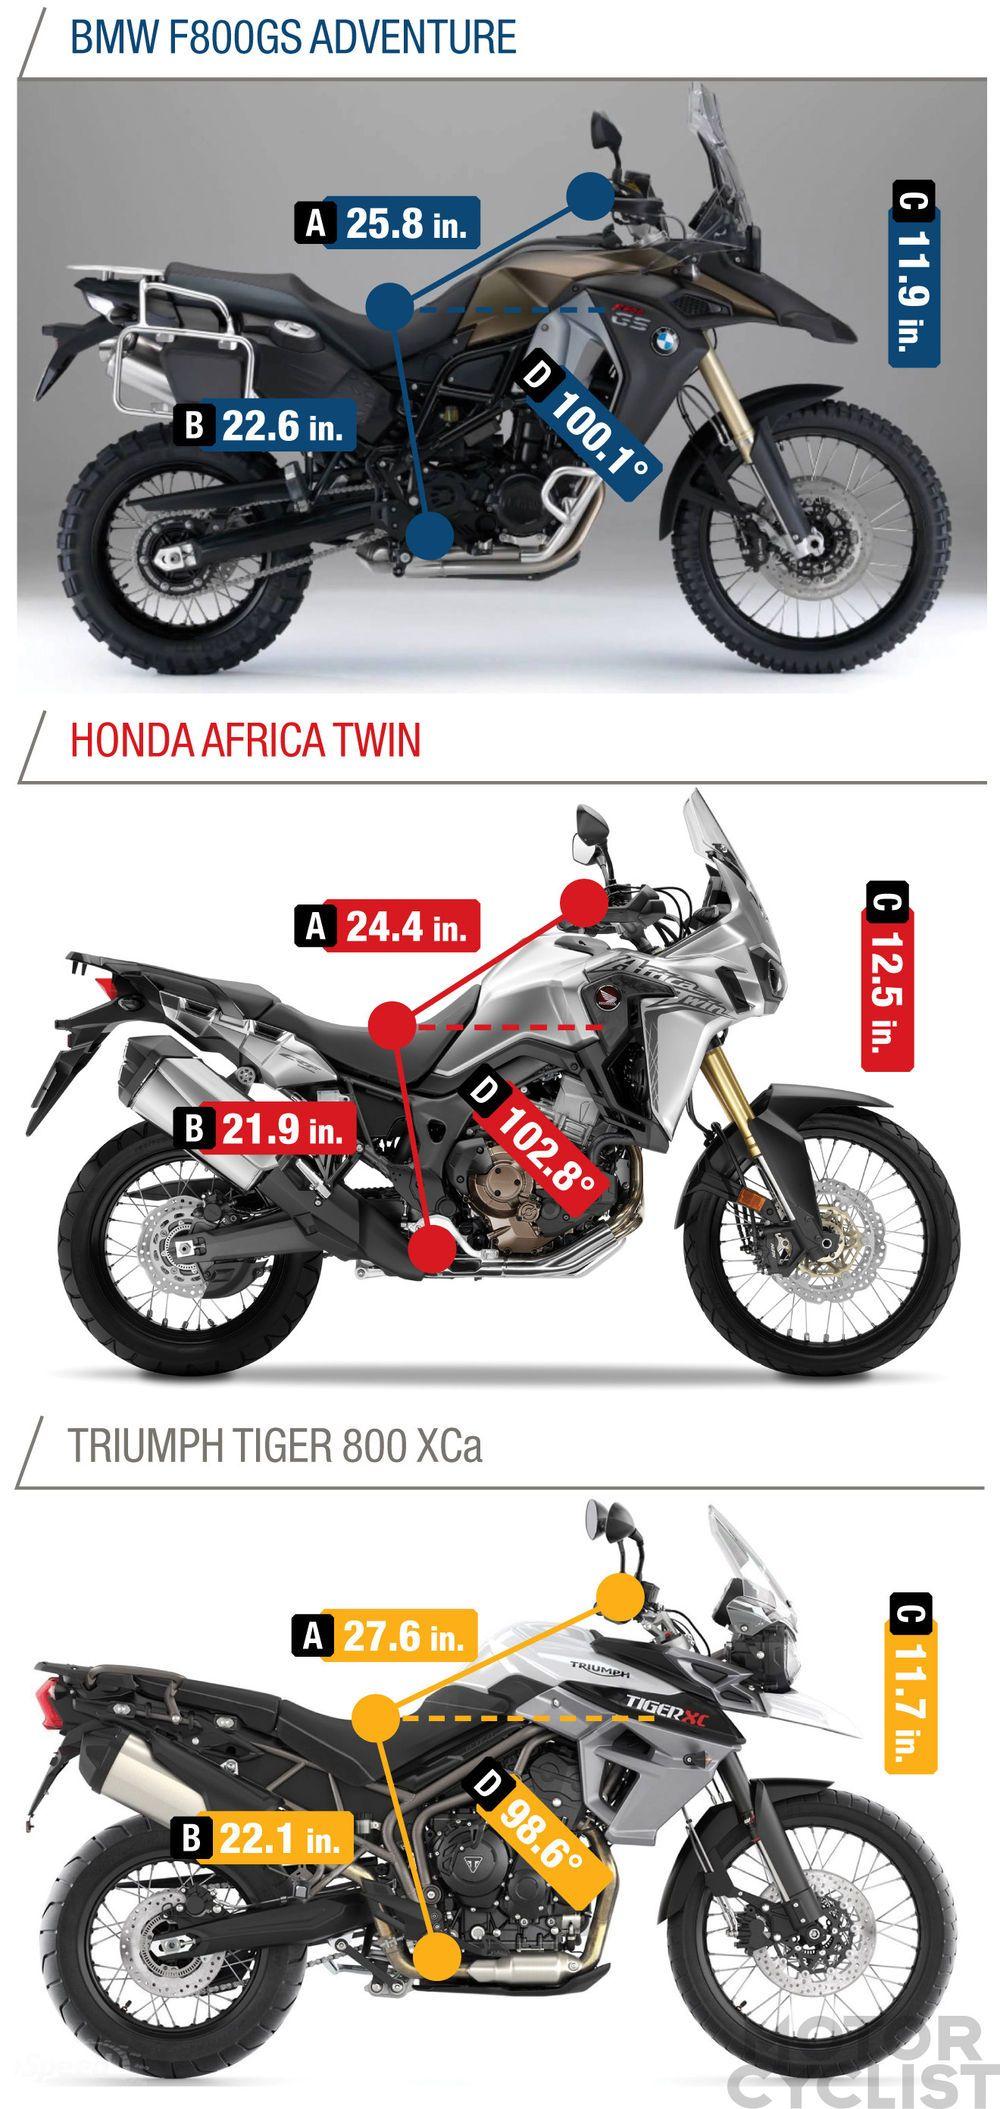 BMW F800GS Adventure vs. Honda Africa Twin vs. Triumph